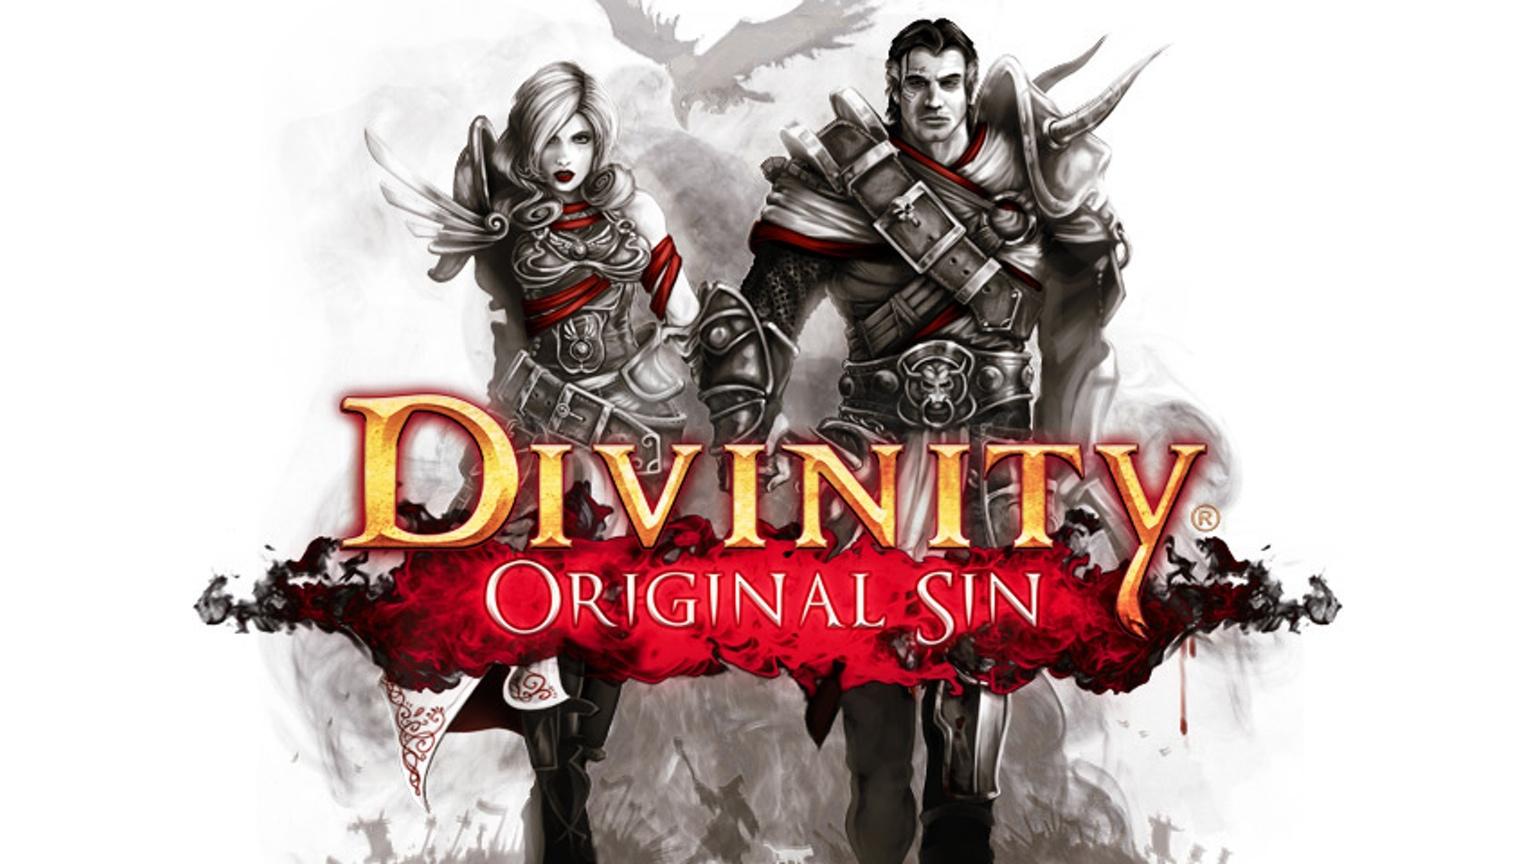 84690967bfe04d1331cc20a4950b72a1_original.jpg - Divinity: Original Sin